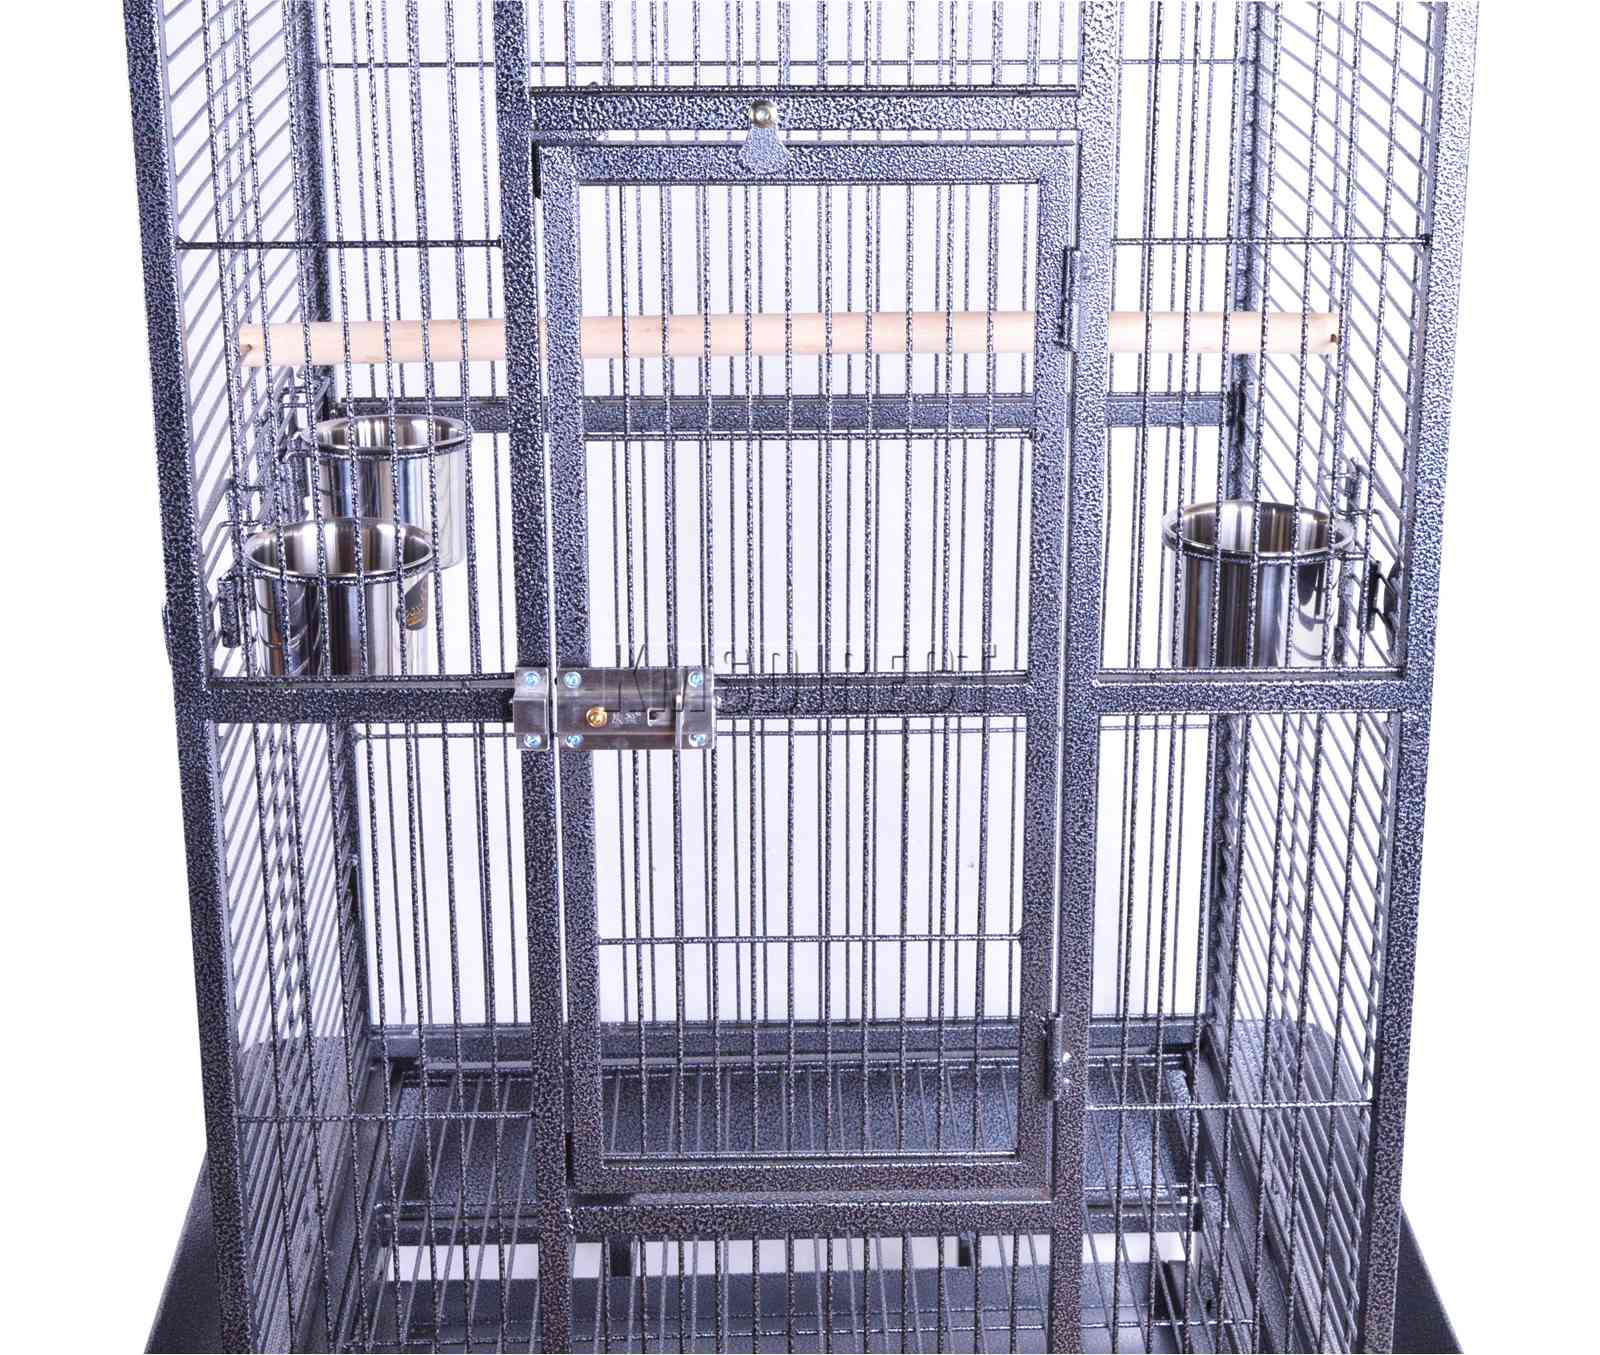 121998112507 2475 I 225 38 BIRD CAGE METAL MBC 04 HAMMERED SILVER KMSWM0202 - Foxhunter Grande Metal Jaula con Soporte Pajarera Loro Periquito Canario Cacatua